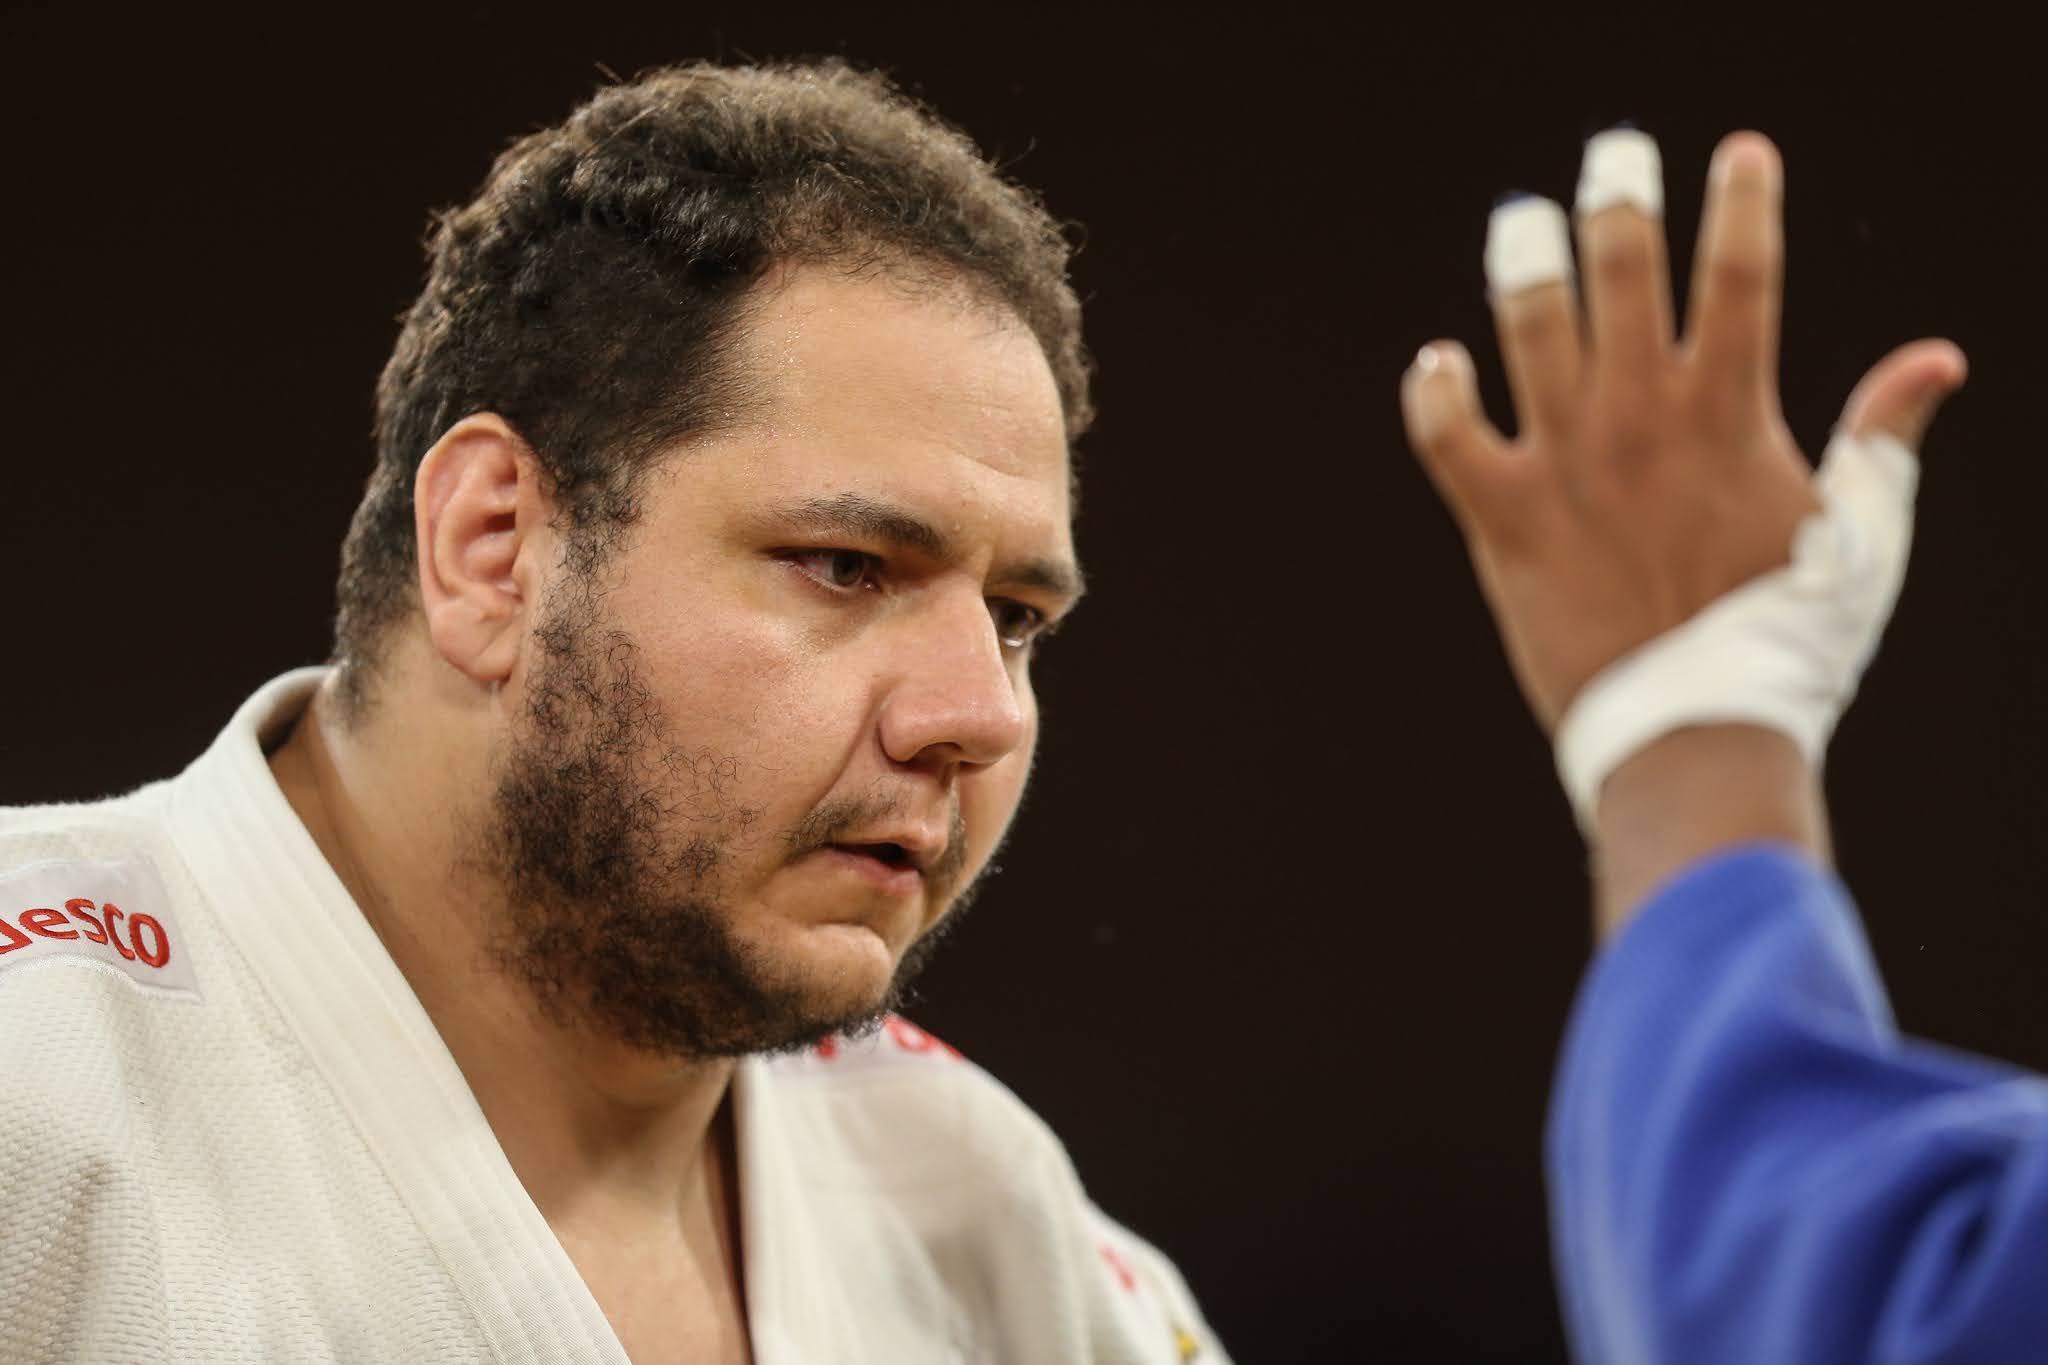 Rafael Silva atleta pesado do judô brasileiro